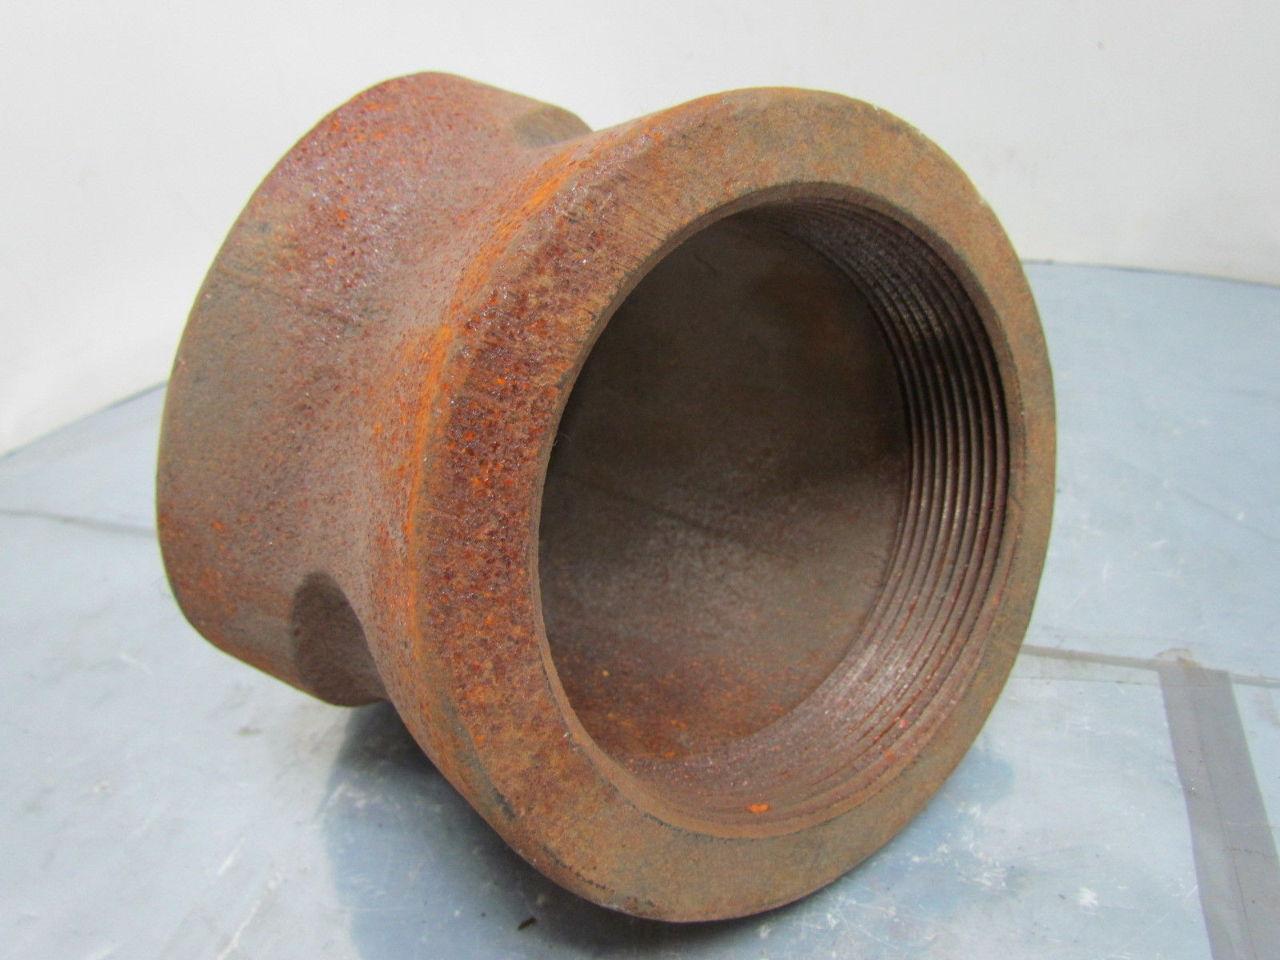 Stockham quot npt cast iron black pipe elbow deg class